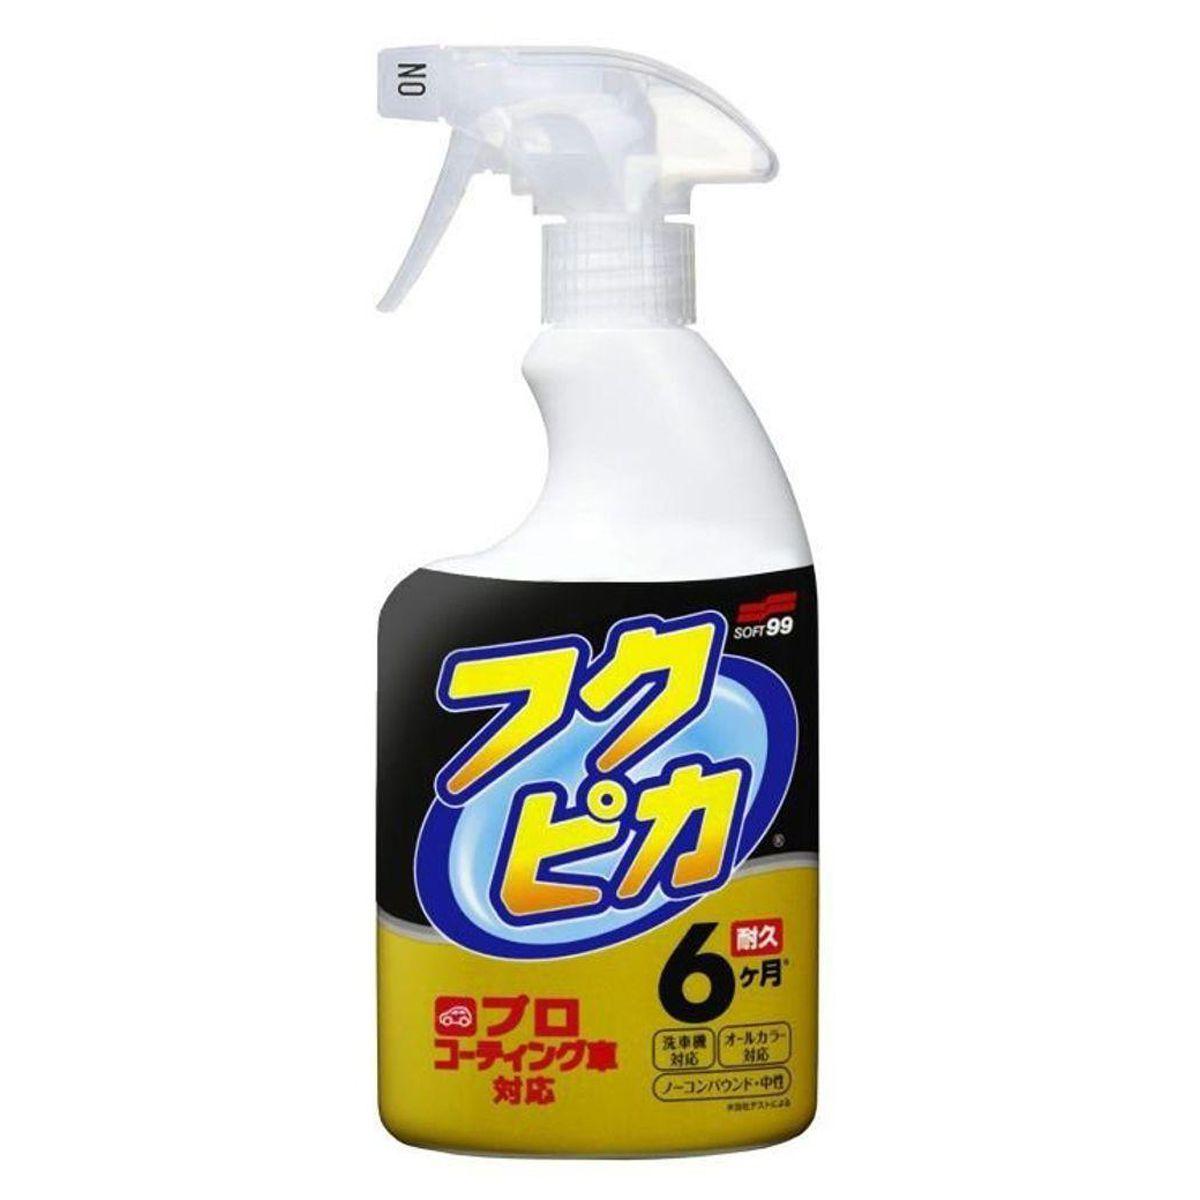 Limpeza A Seco Com Cera Fukupika Strong 400ml Soft99